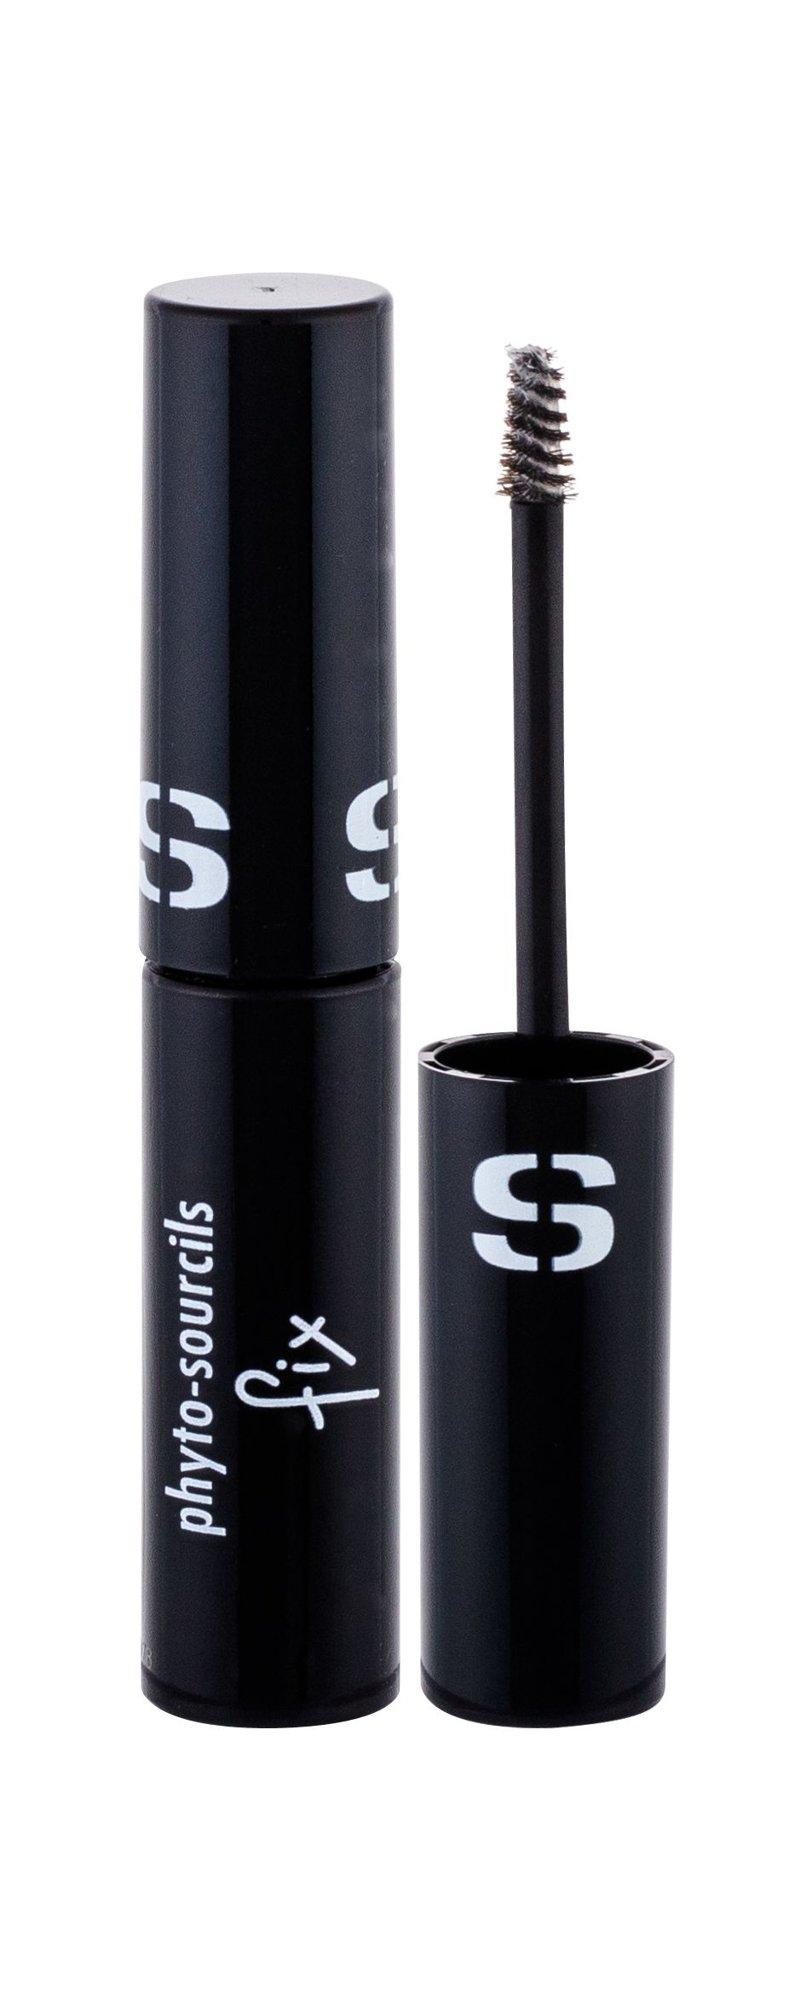 Sisley Phyto-Sourcils Eyebrow Gel and Eyebrow Pomade 5ml 0 Transparent